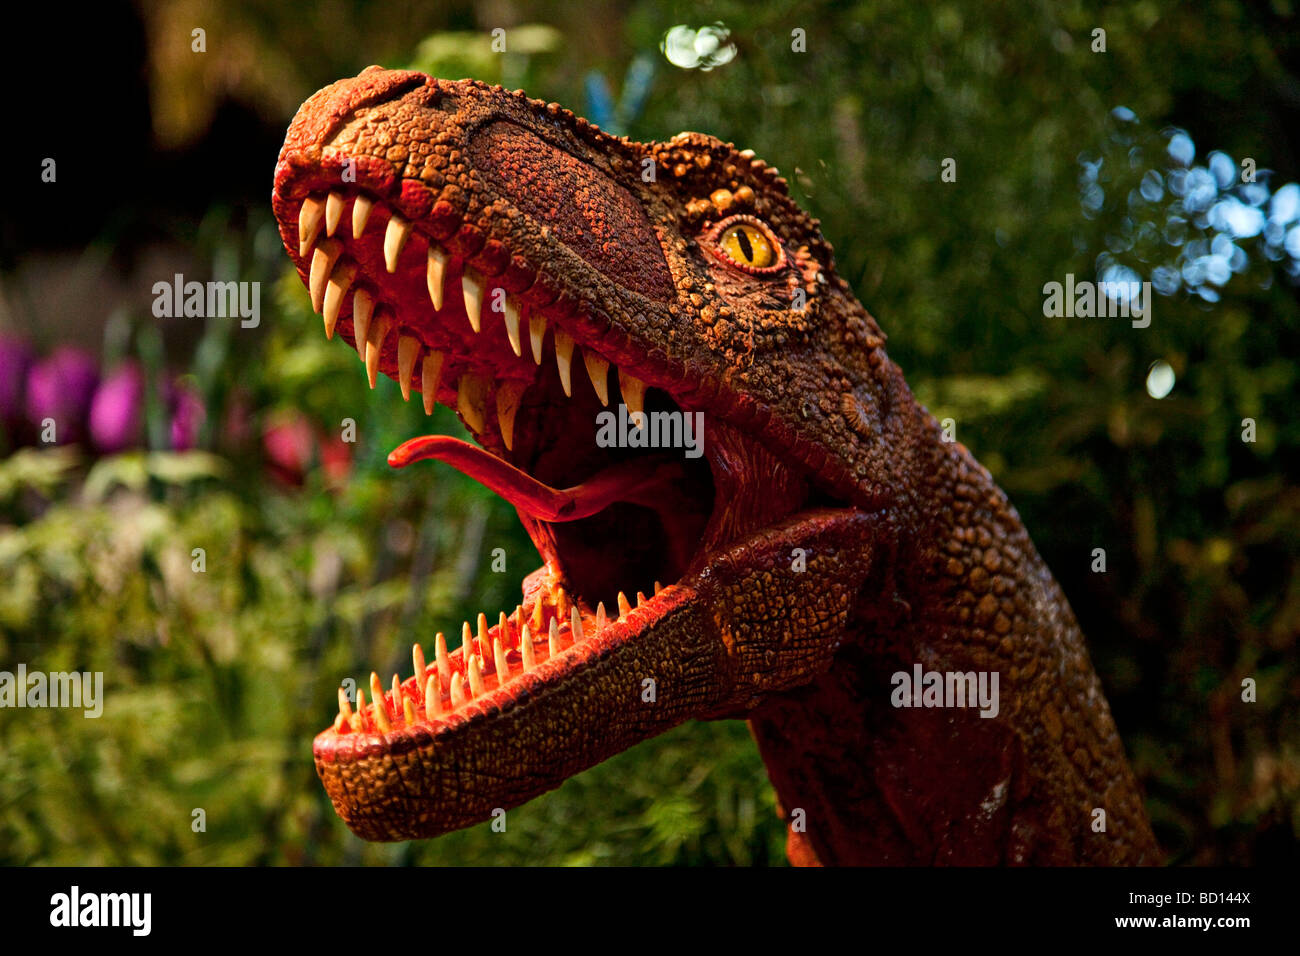 Dinosaur raptor - Stock Image